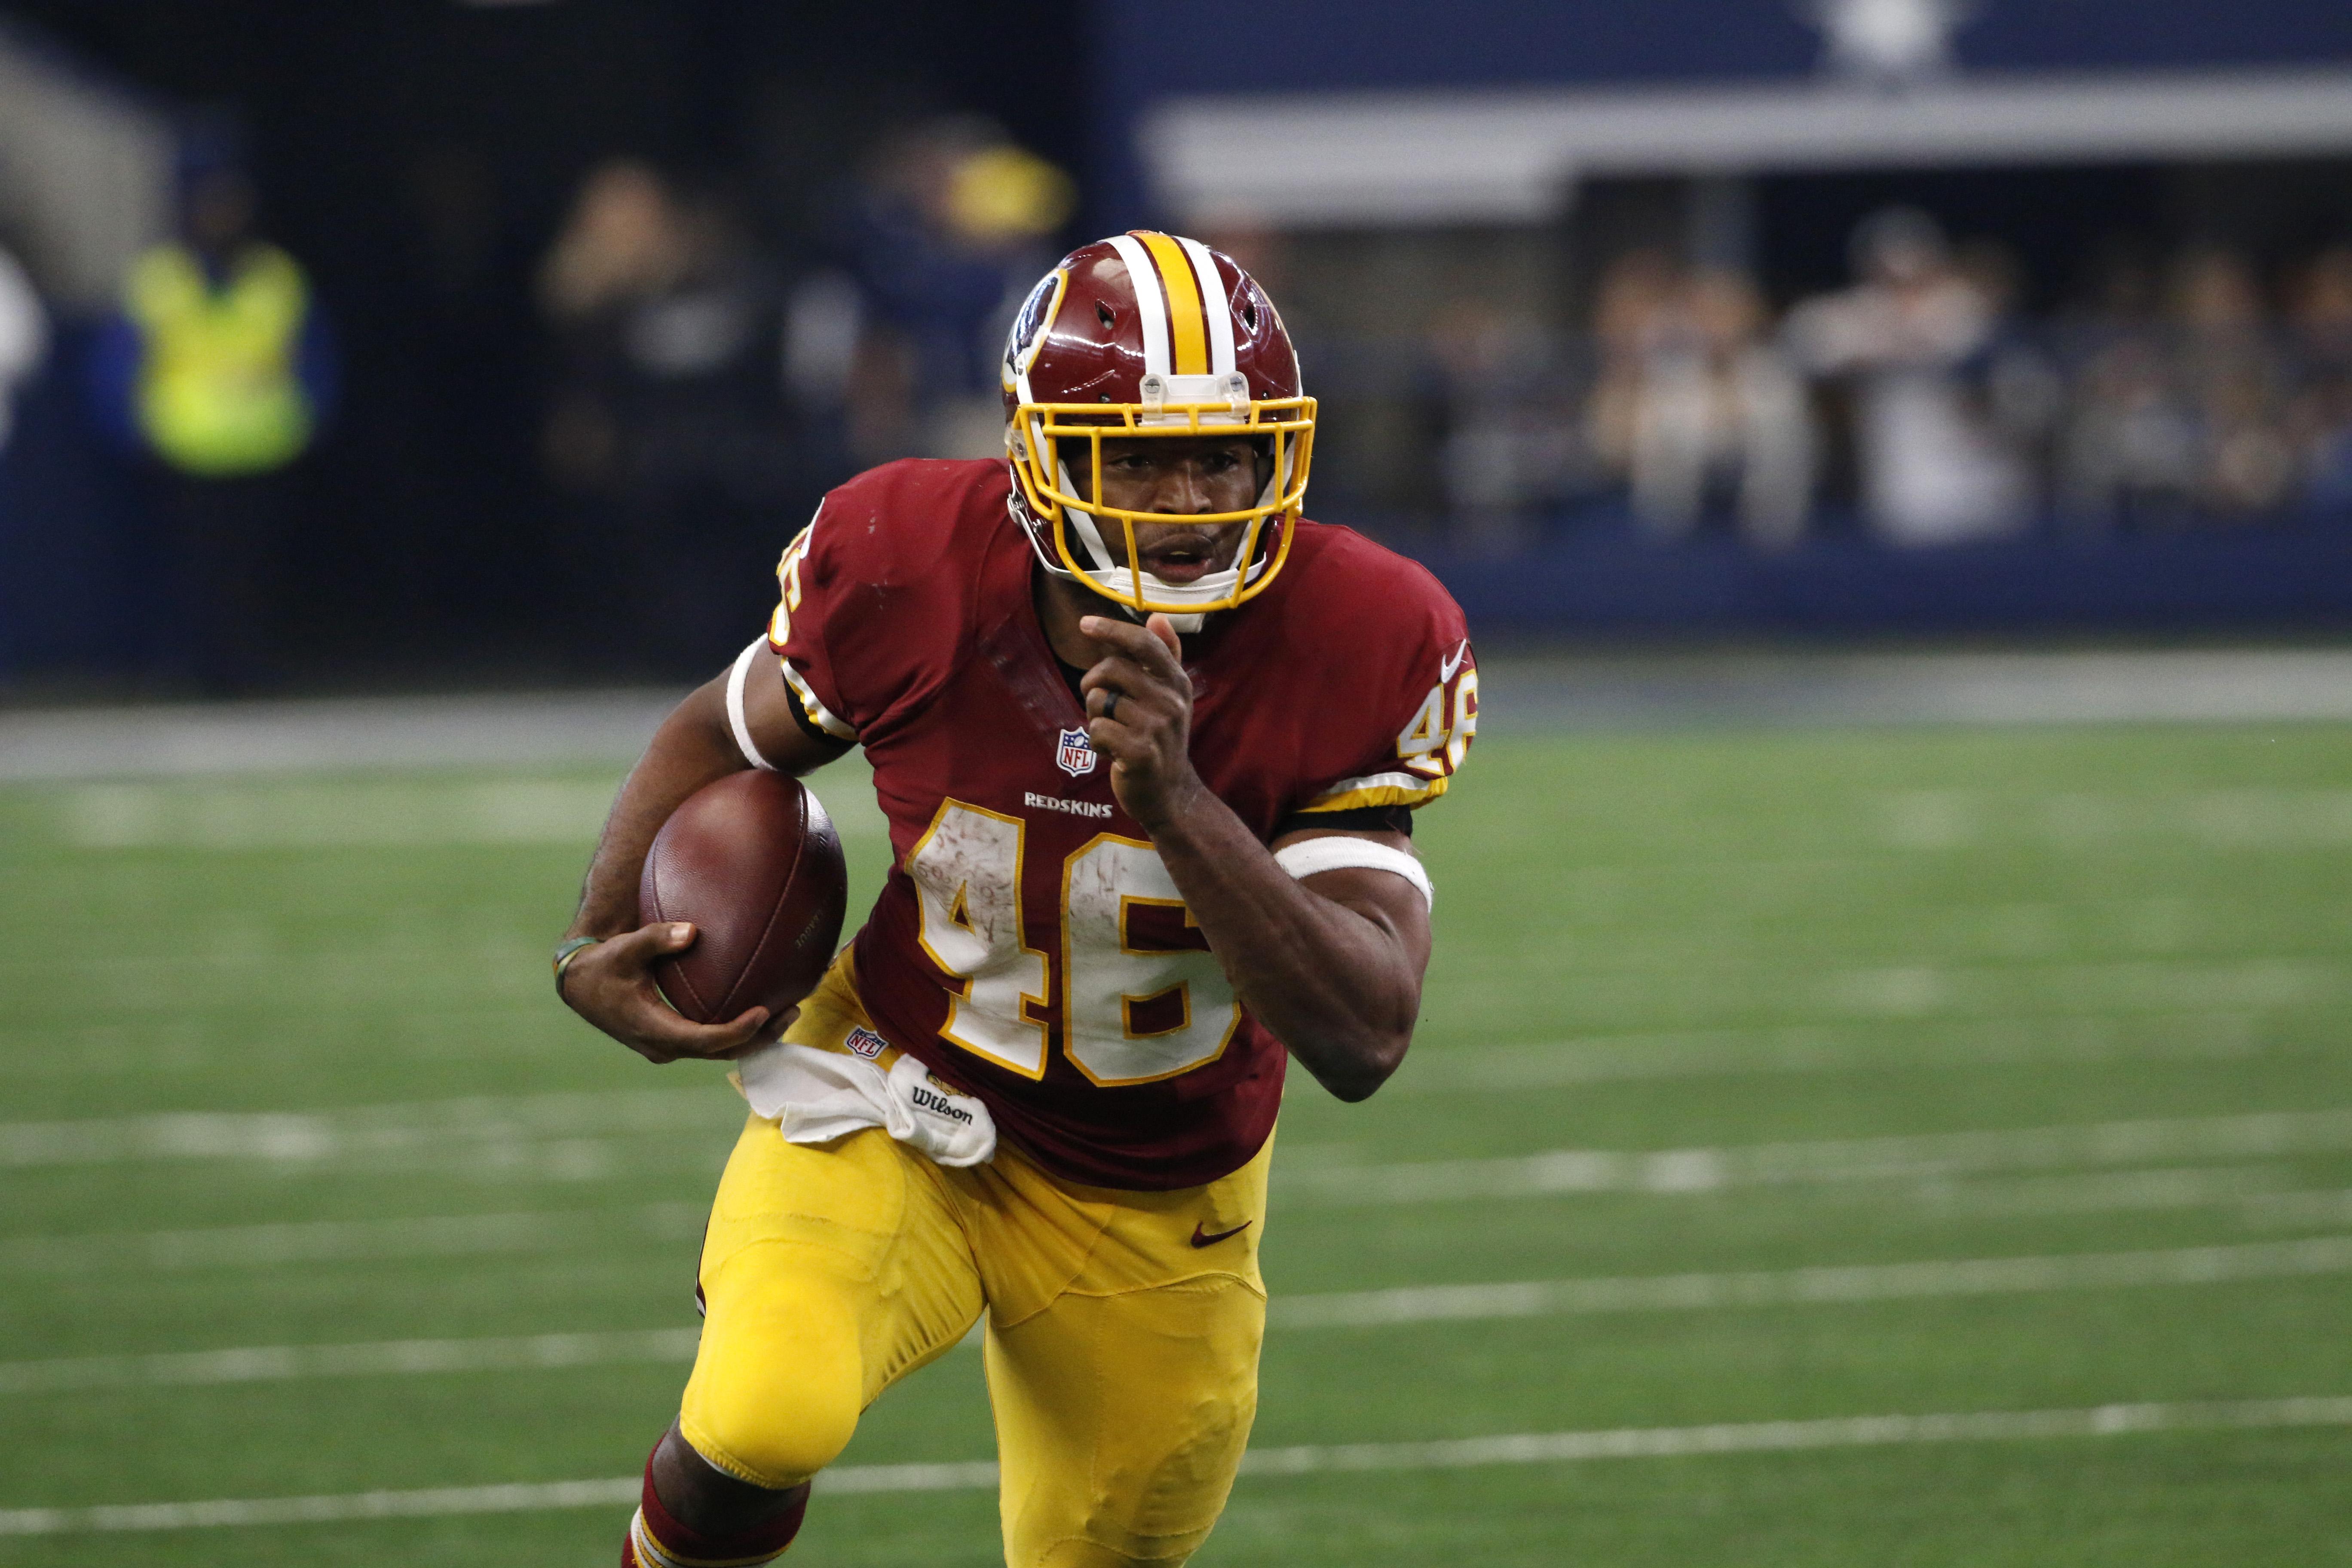 Washington Redskins running back Alfred Morris (46) runs the ball against the Dallas Cowboys during an NFL football game, Sunday, Jan. 3, 2016, in Arlington, Texas. (AP Photo/Roger Steinman)